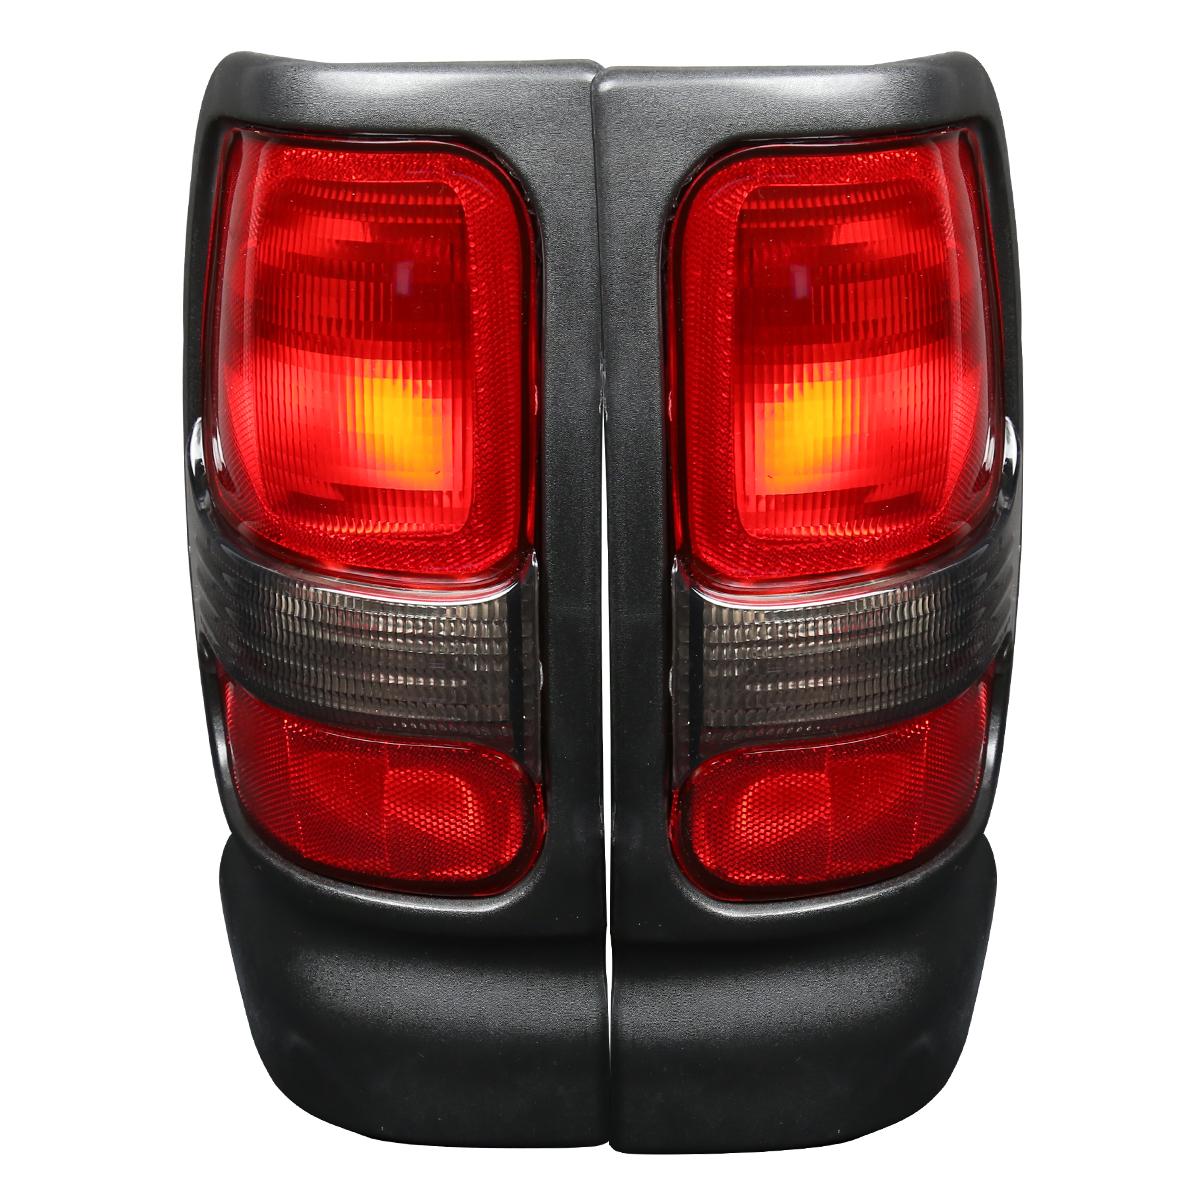 For 1994 2001 Dodge Ram 1500 2500 3500 Truck Black Red